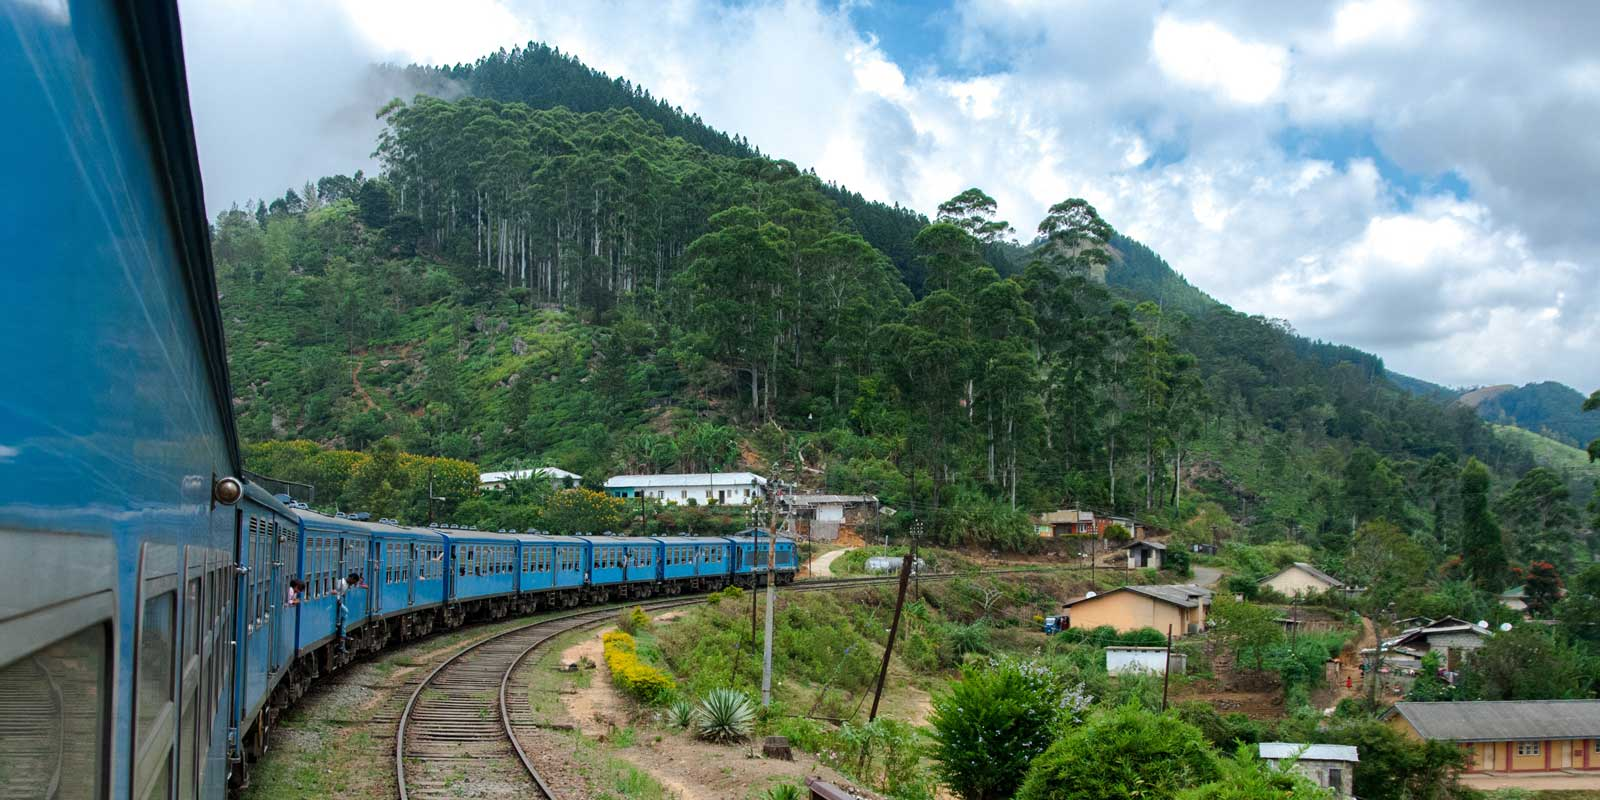 Roll through Sri Lanka via train and see it's pretty countryside. Bonus: Make your friends jealous with a selfie on Sri Lanka's popular blue trains.